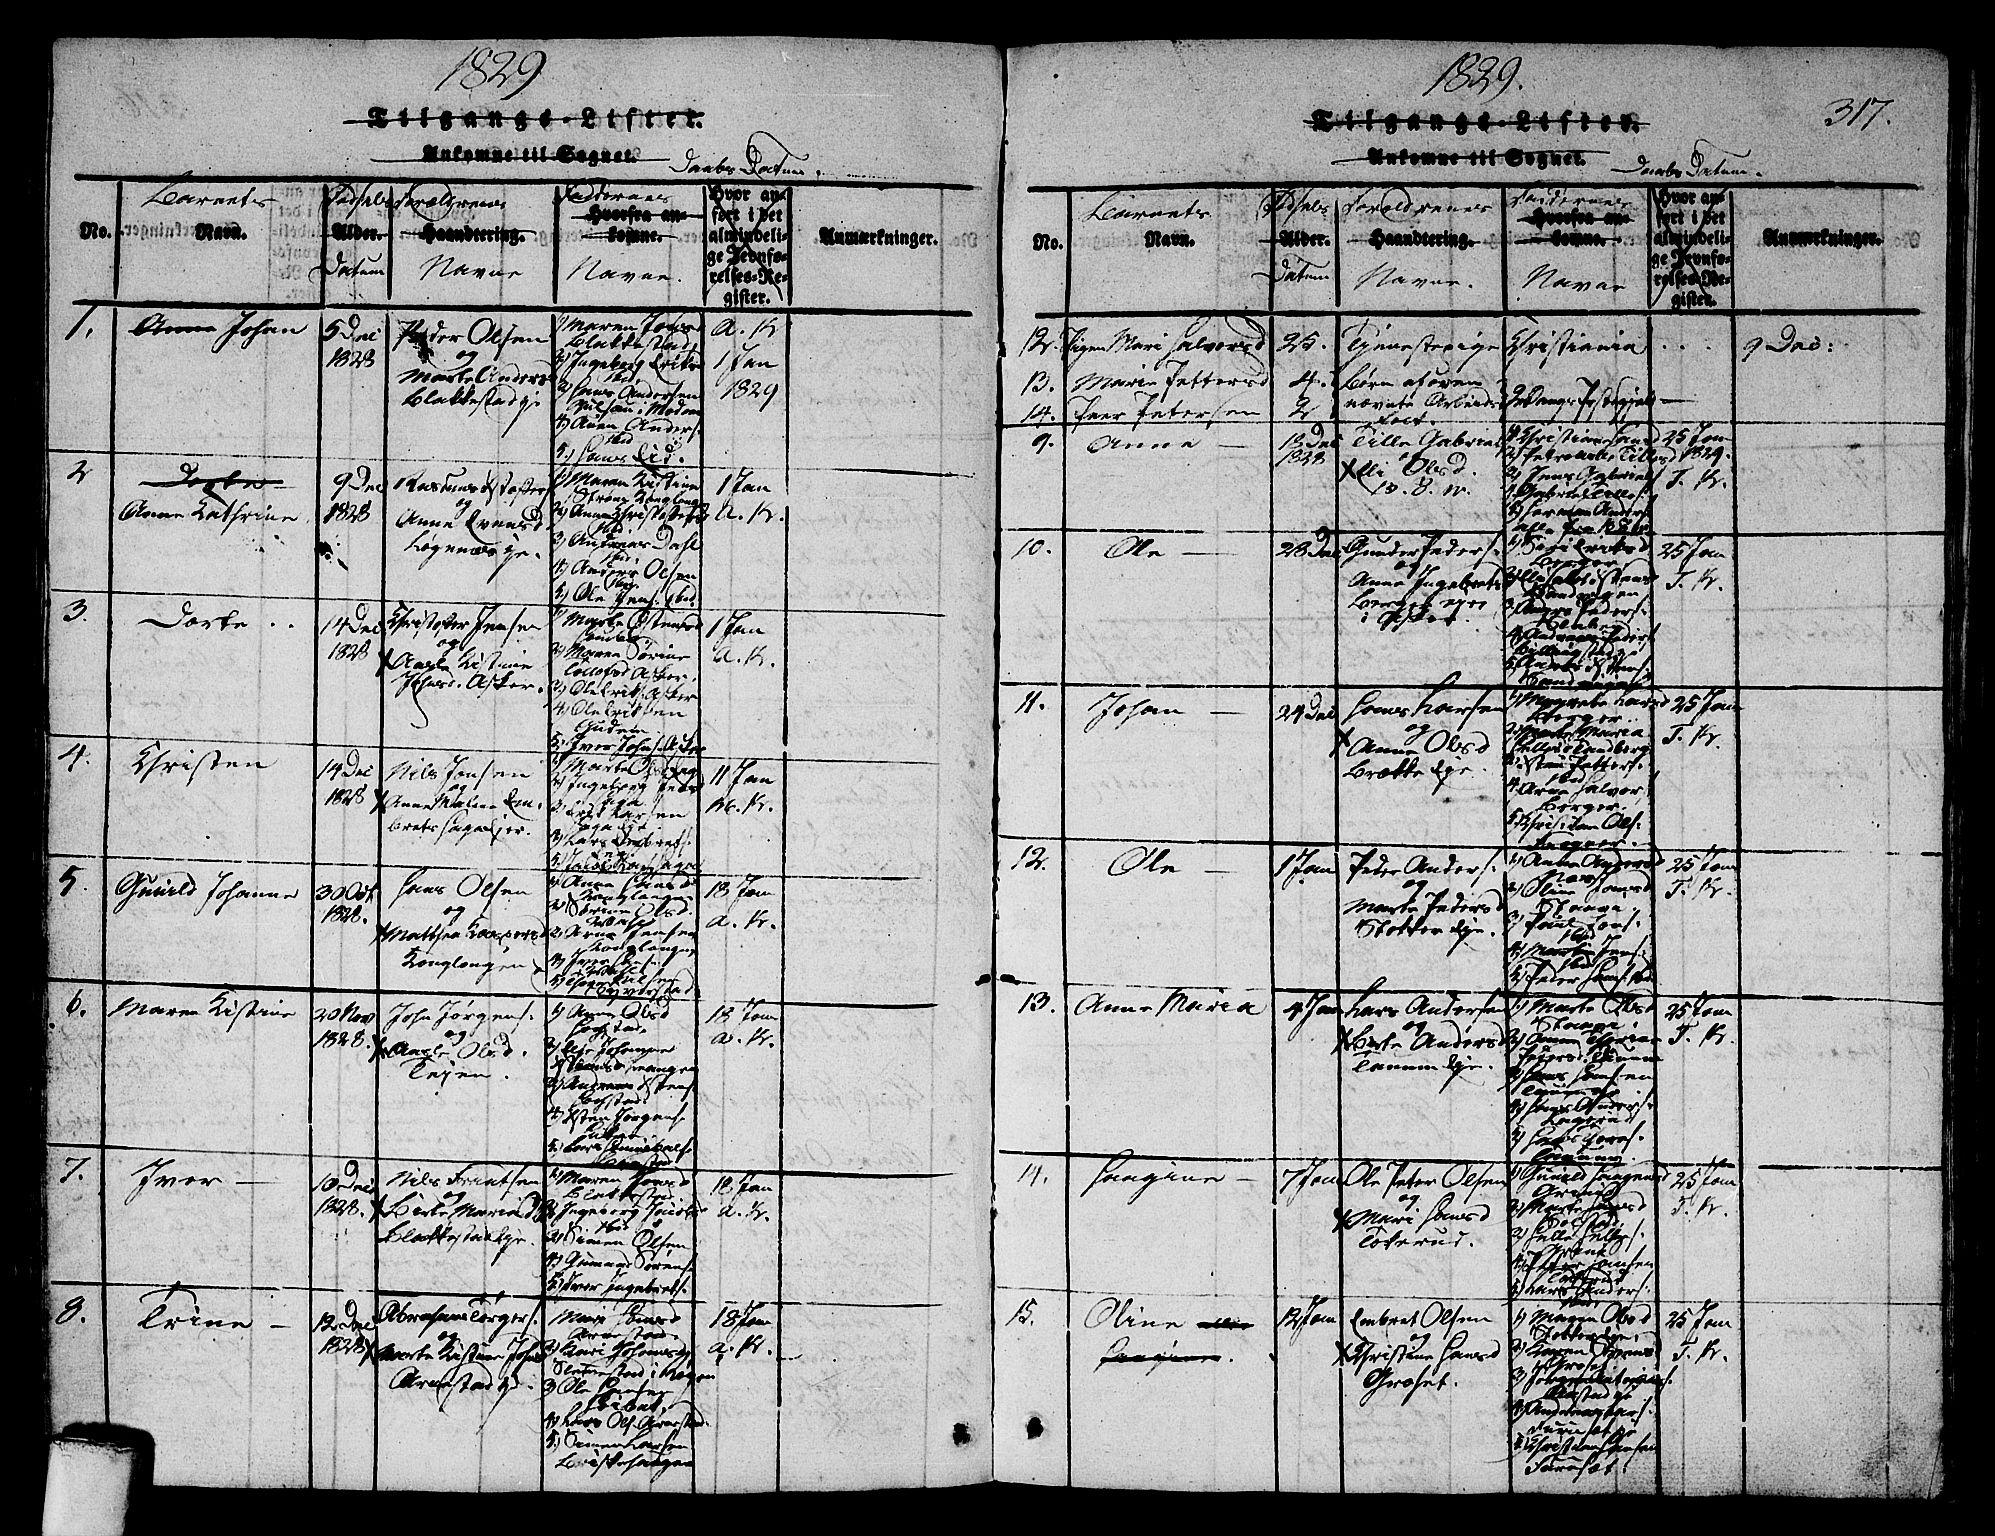 SAO, Asker prestekontor Kirkebøker, G/Ga/L0001: Klokkerbok nr. I 1, 1814-1830, s. 317